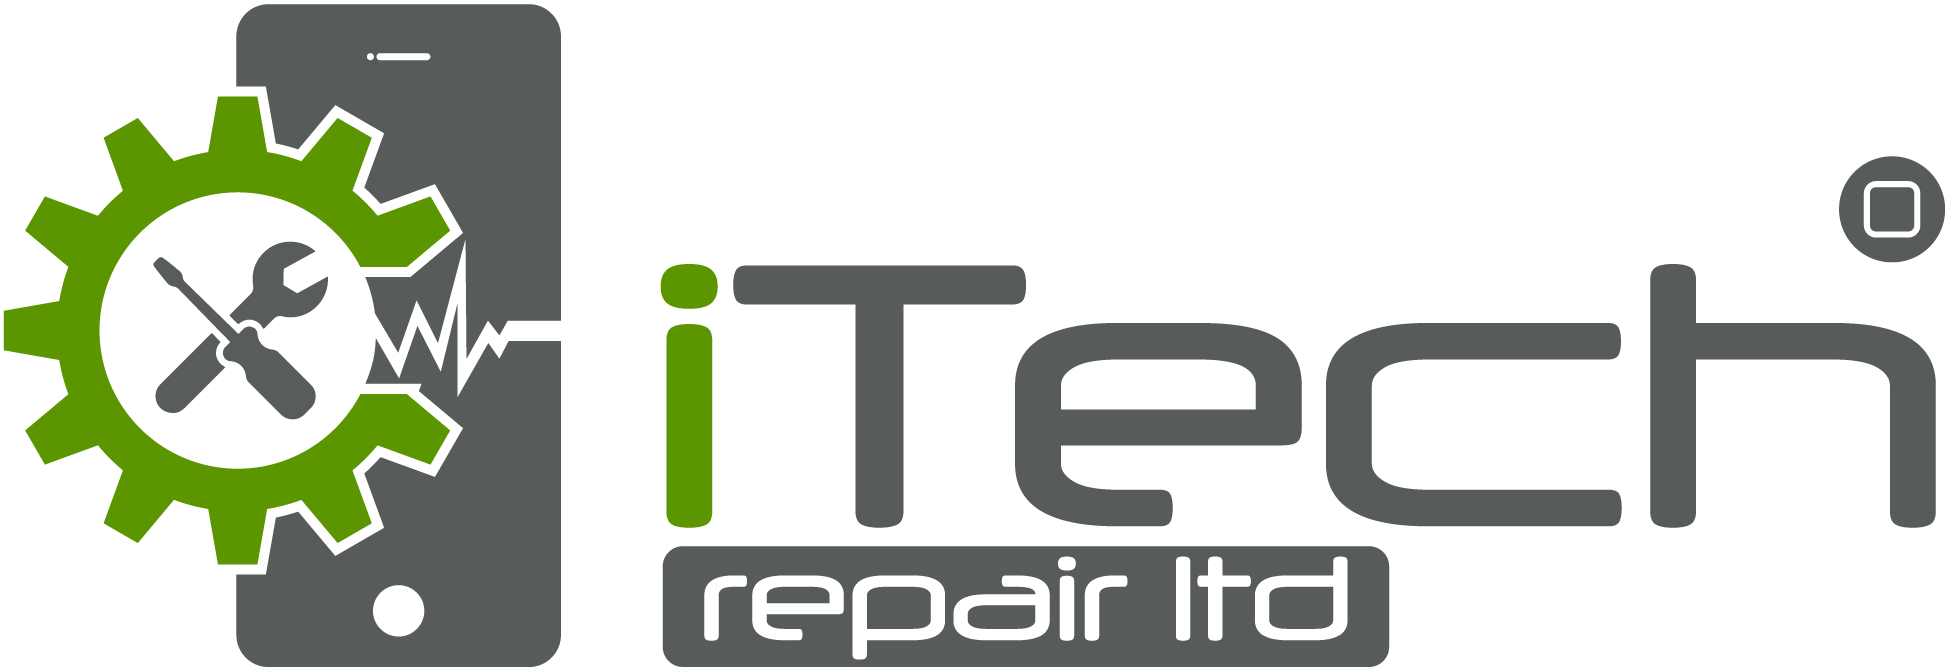 Fast iPhone, iPad, iPod, Repairs in the UK Provided iPAQ Repair & Parts